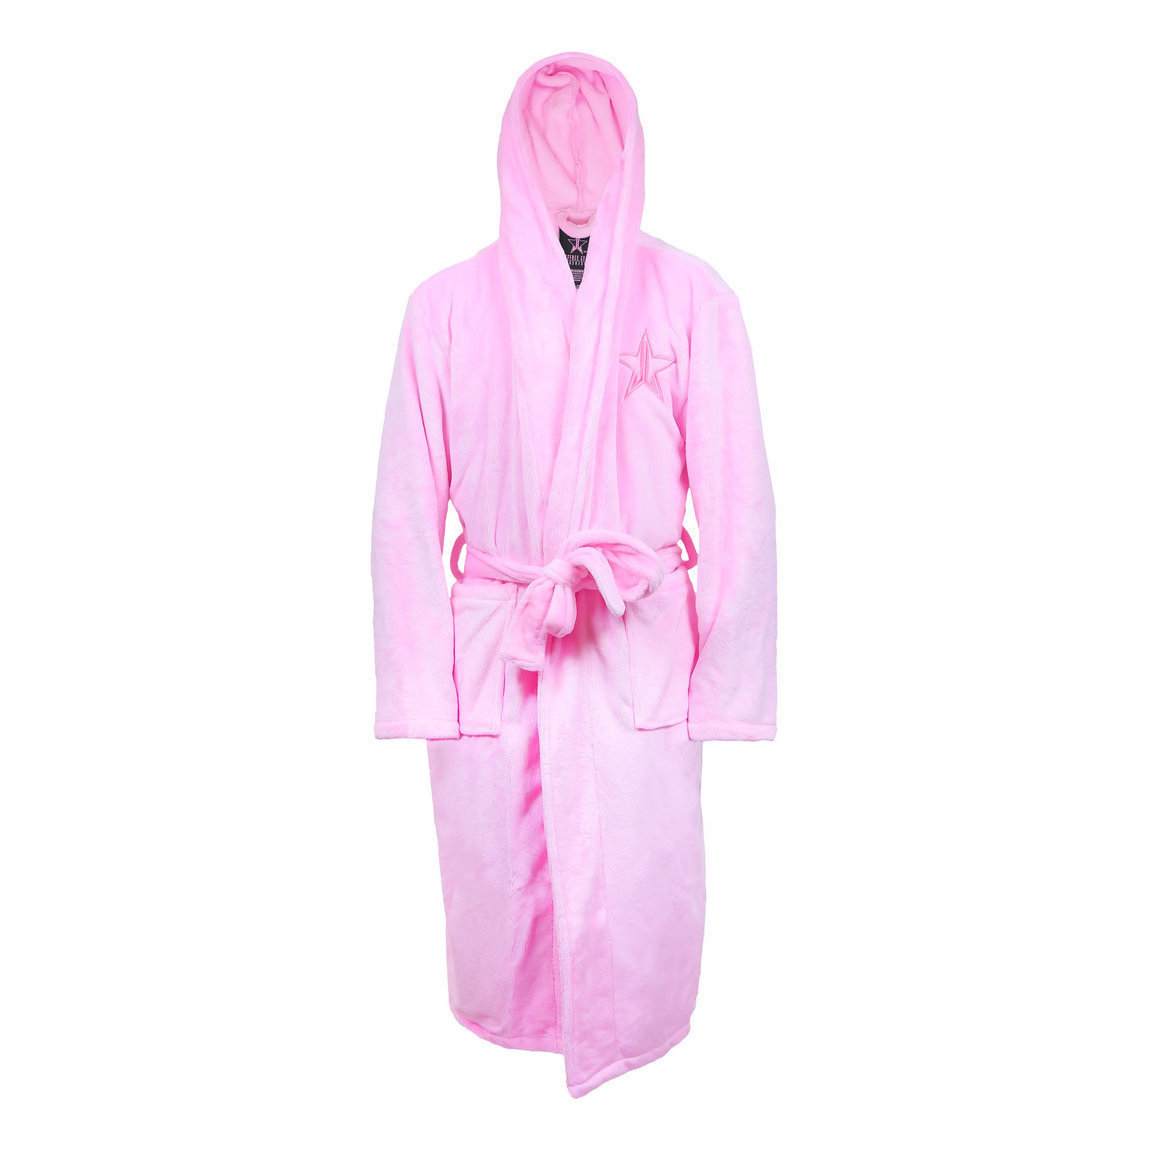 Jeffree Star Cosmetics Pink Star Robe Small alternative view 1 - product swatch.